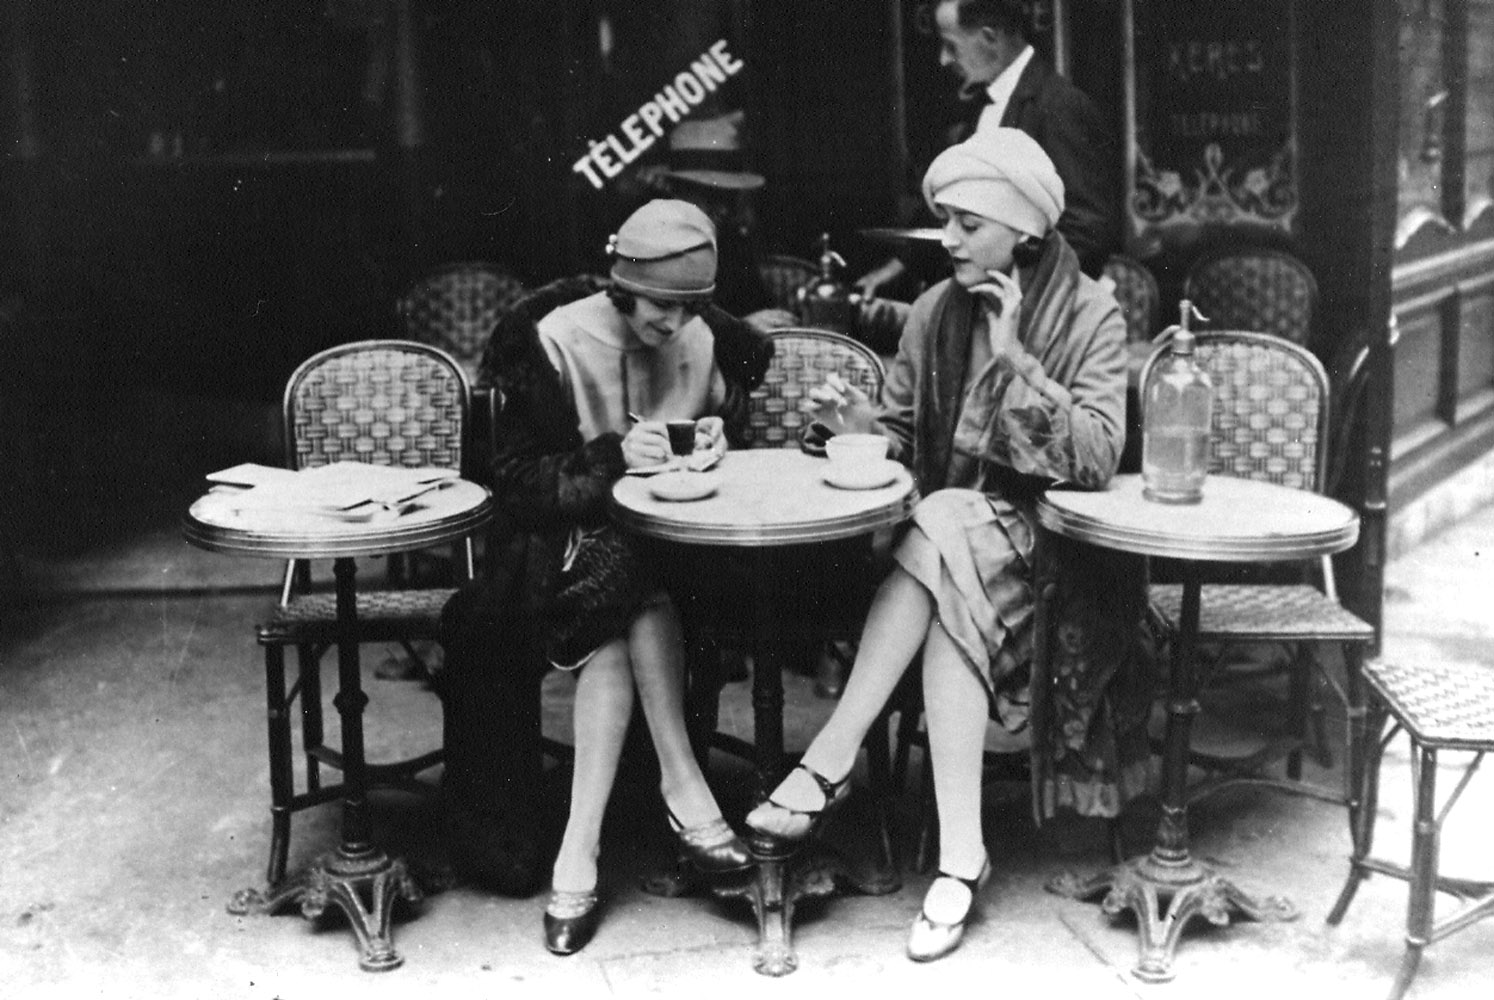 Foto: Solita Solano și Djuna Barnes în Paris (Maurice Brange, Au Café, 1922).